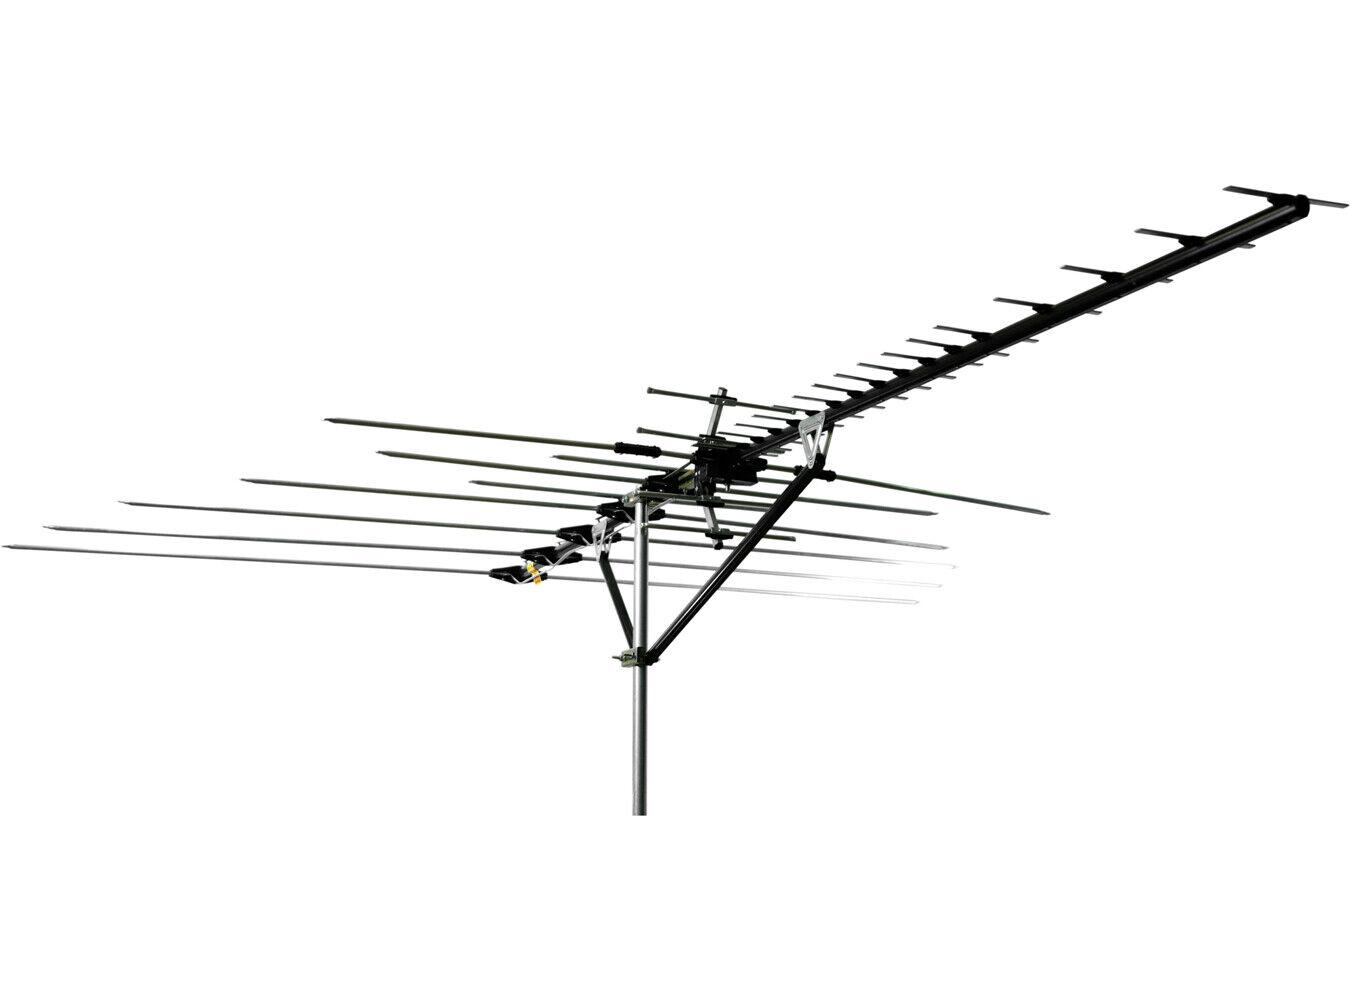 CM-5020 channelmasteroutlet Channel Master Masterpiece 100 Outdoor TV Antenna Heavy Duty Long Range CM-5020